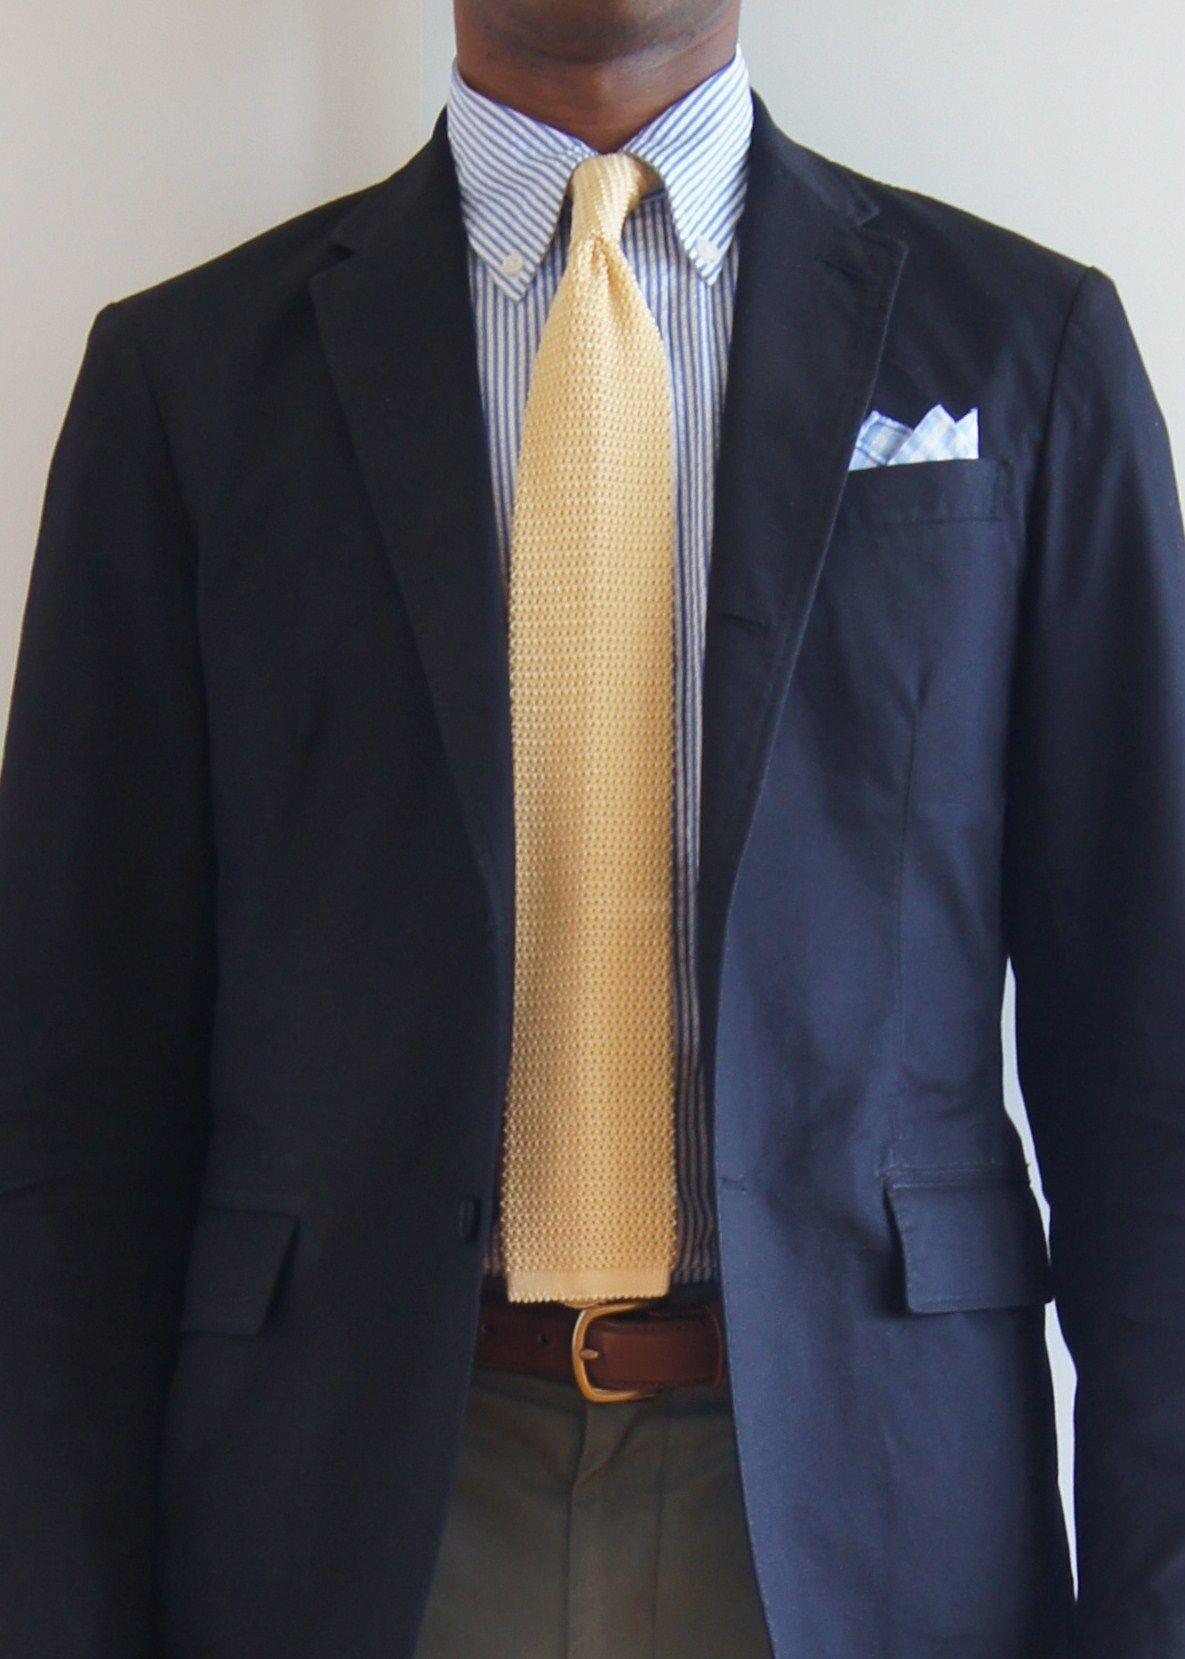 Navy sport coat, white shirt with light blue dress stripes